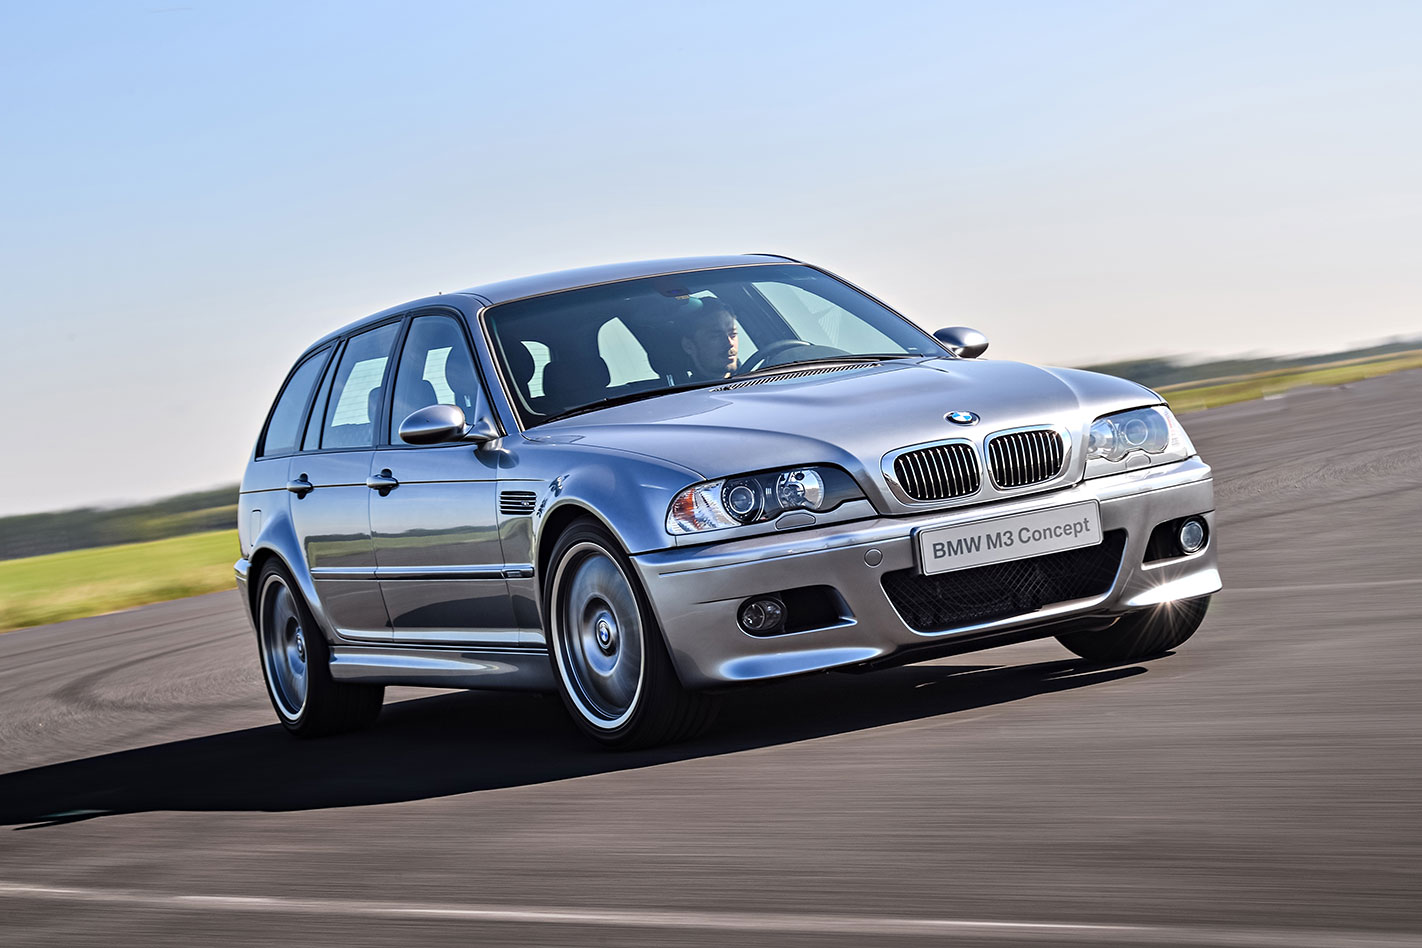 BMW E46 M3 wagon front